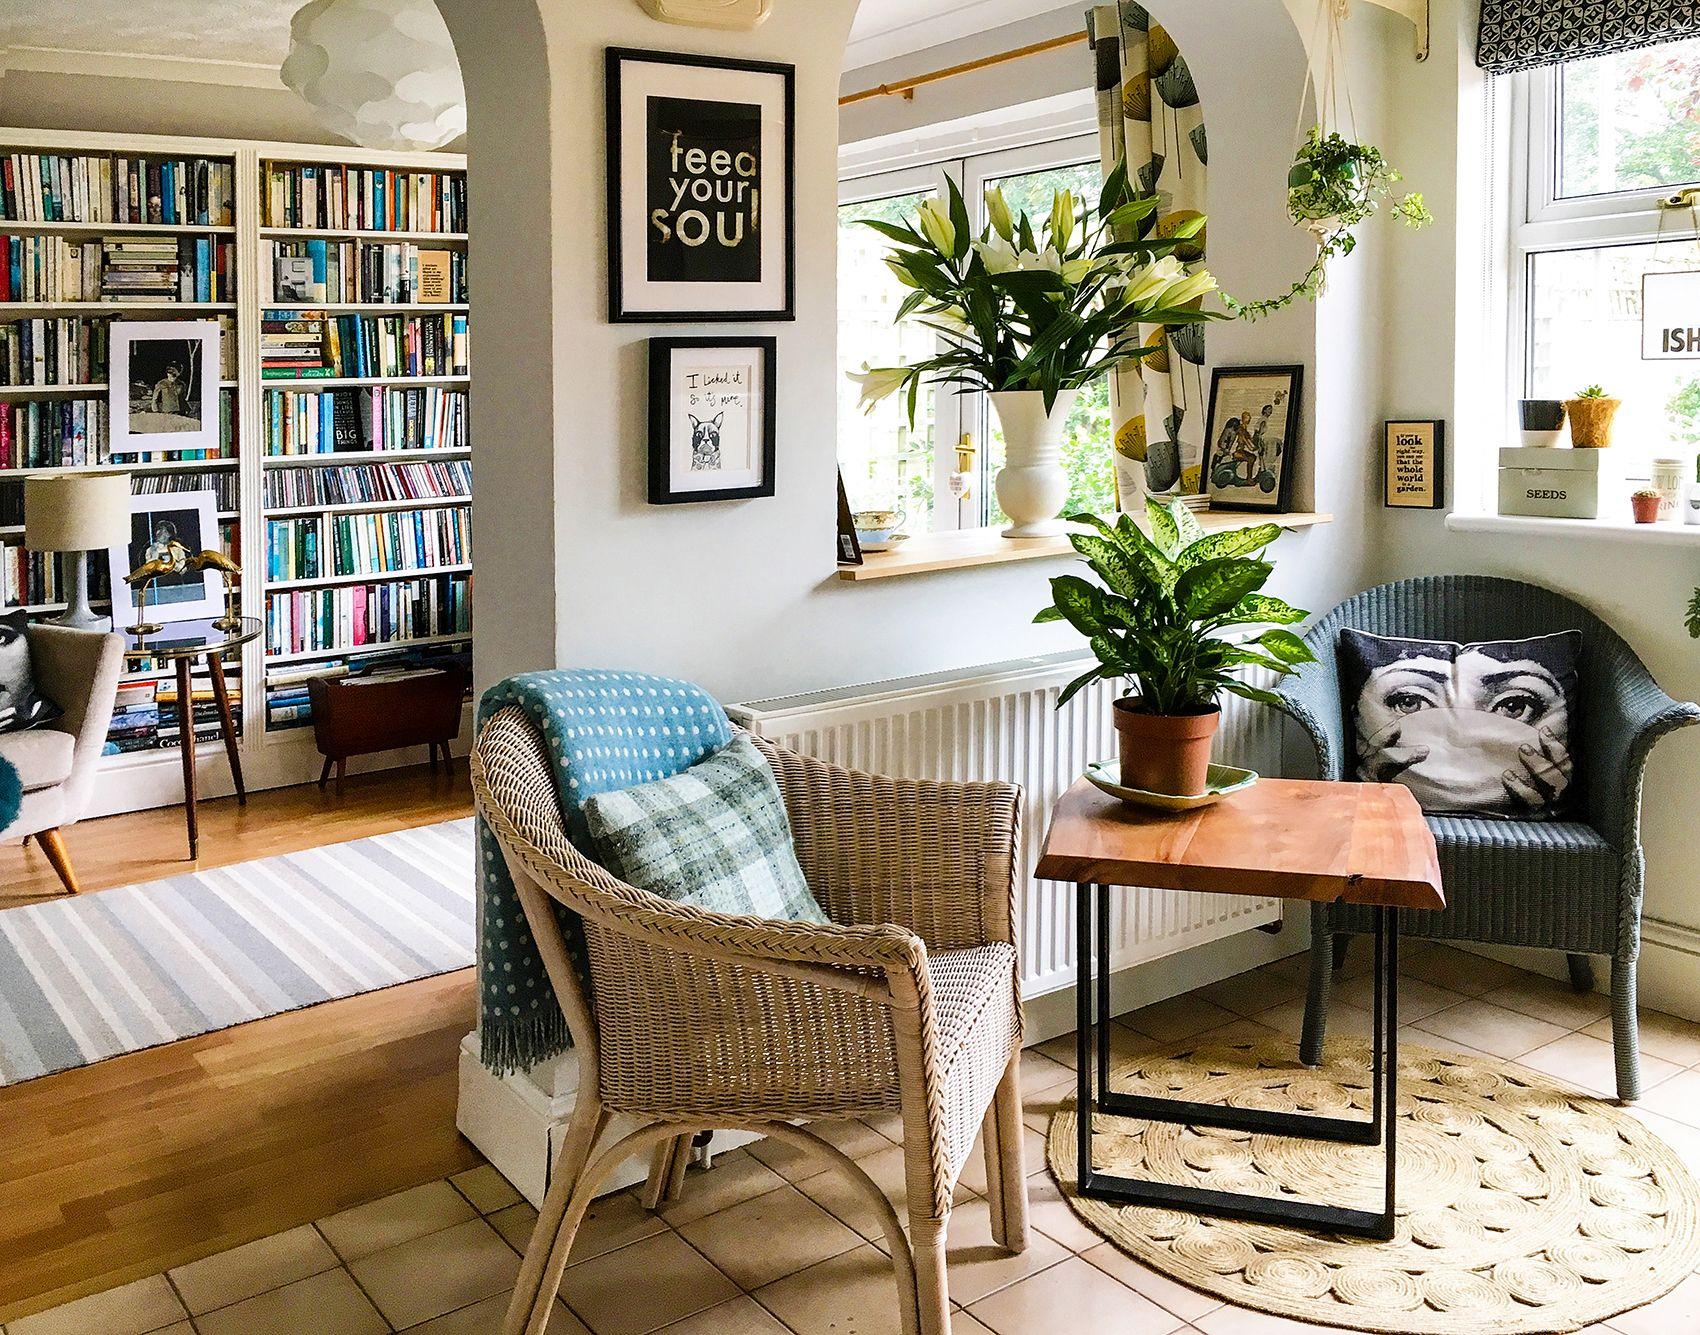 A 1930s Bristol England Home For A Book Lover Living Room Decor Western Living Room Decor Home Living room ideas england